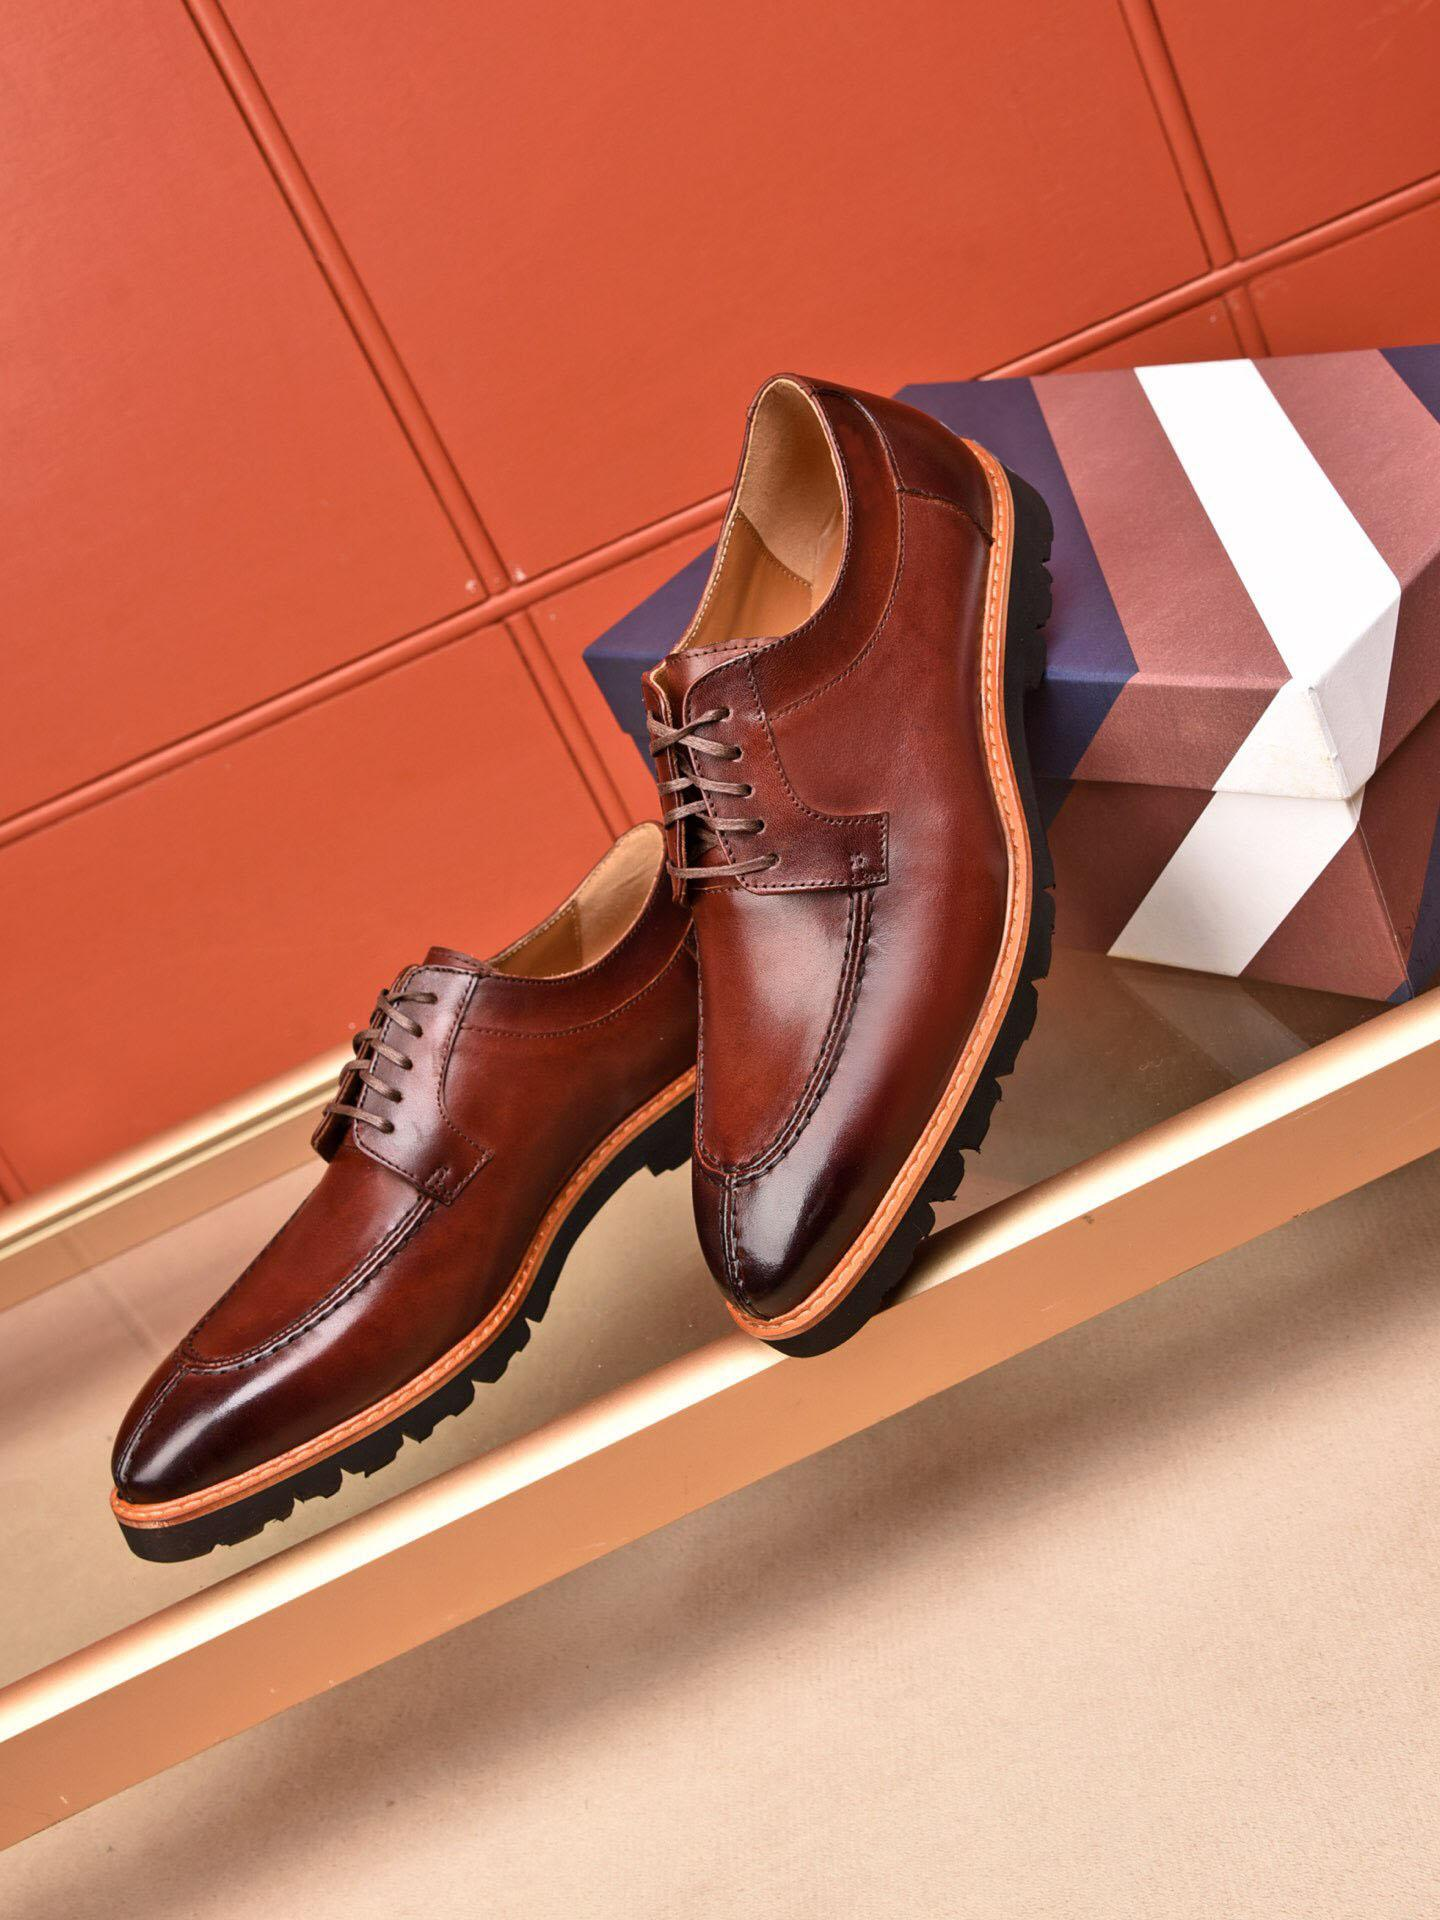 bc5c439d9d99 2019 Luxury Gentleman Party Business Loafers Brand Dress Shoes Genuine  Leather Oxfords Men s Leisure Fashion Flats Zapatos Hombre Size 38-44 Men  Oxfords ...